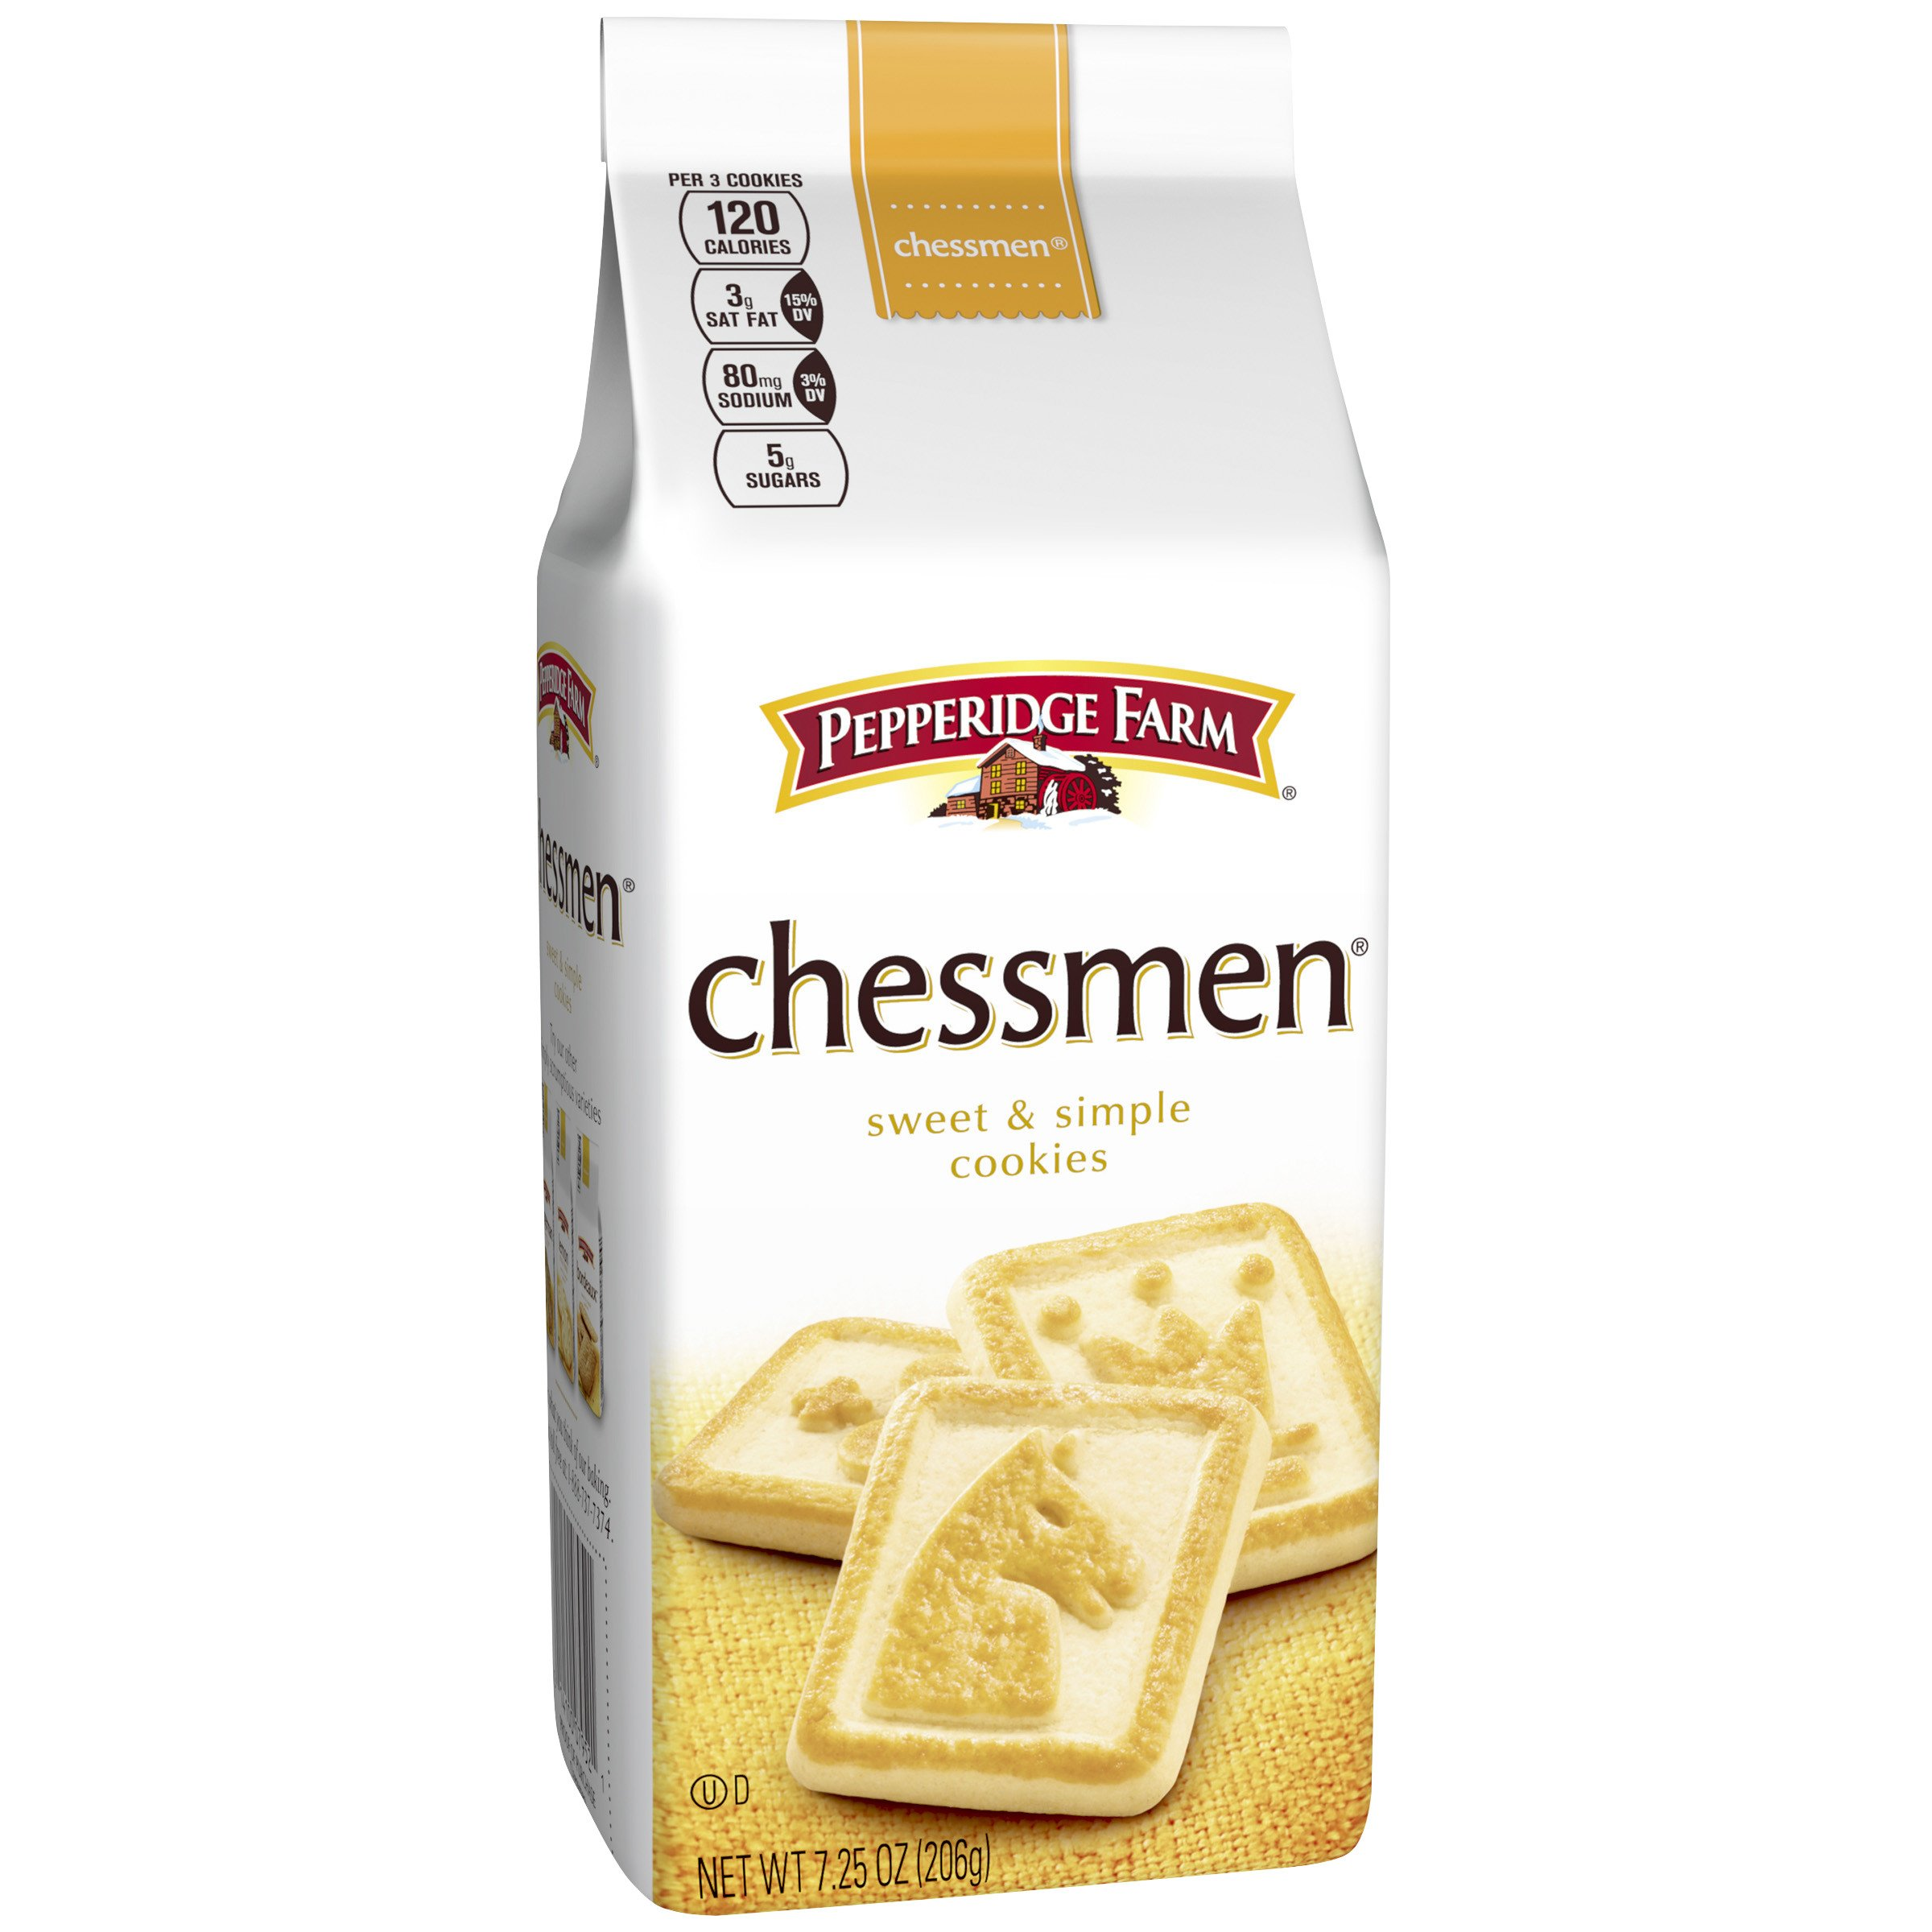 Pepperidge Farm, Chessmen, Cookies, 7.25 oz, Bag